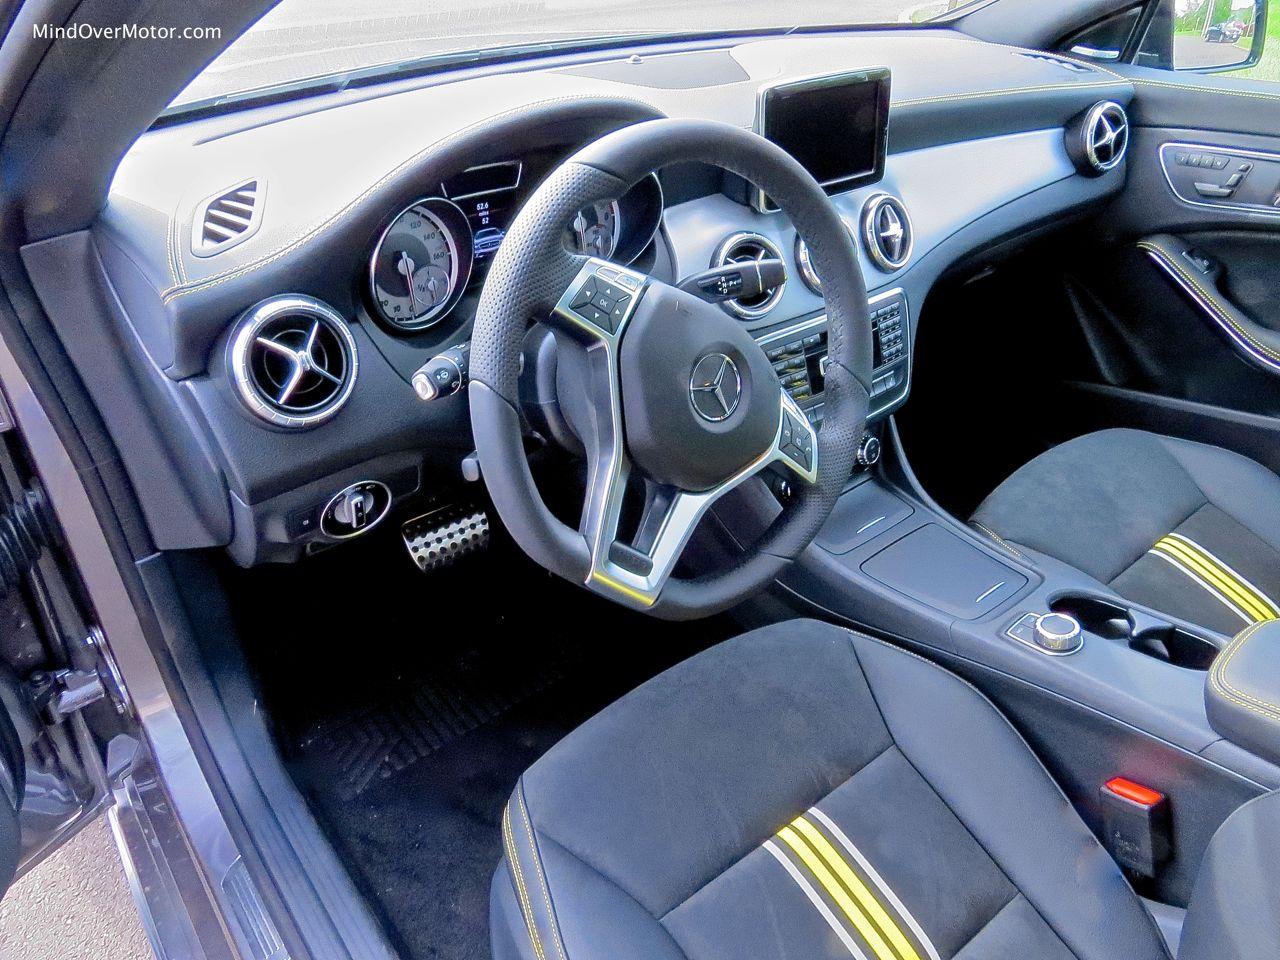 Mercedes-Benz CLA250 Driver's Seat